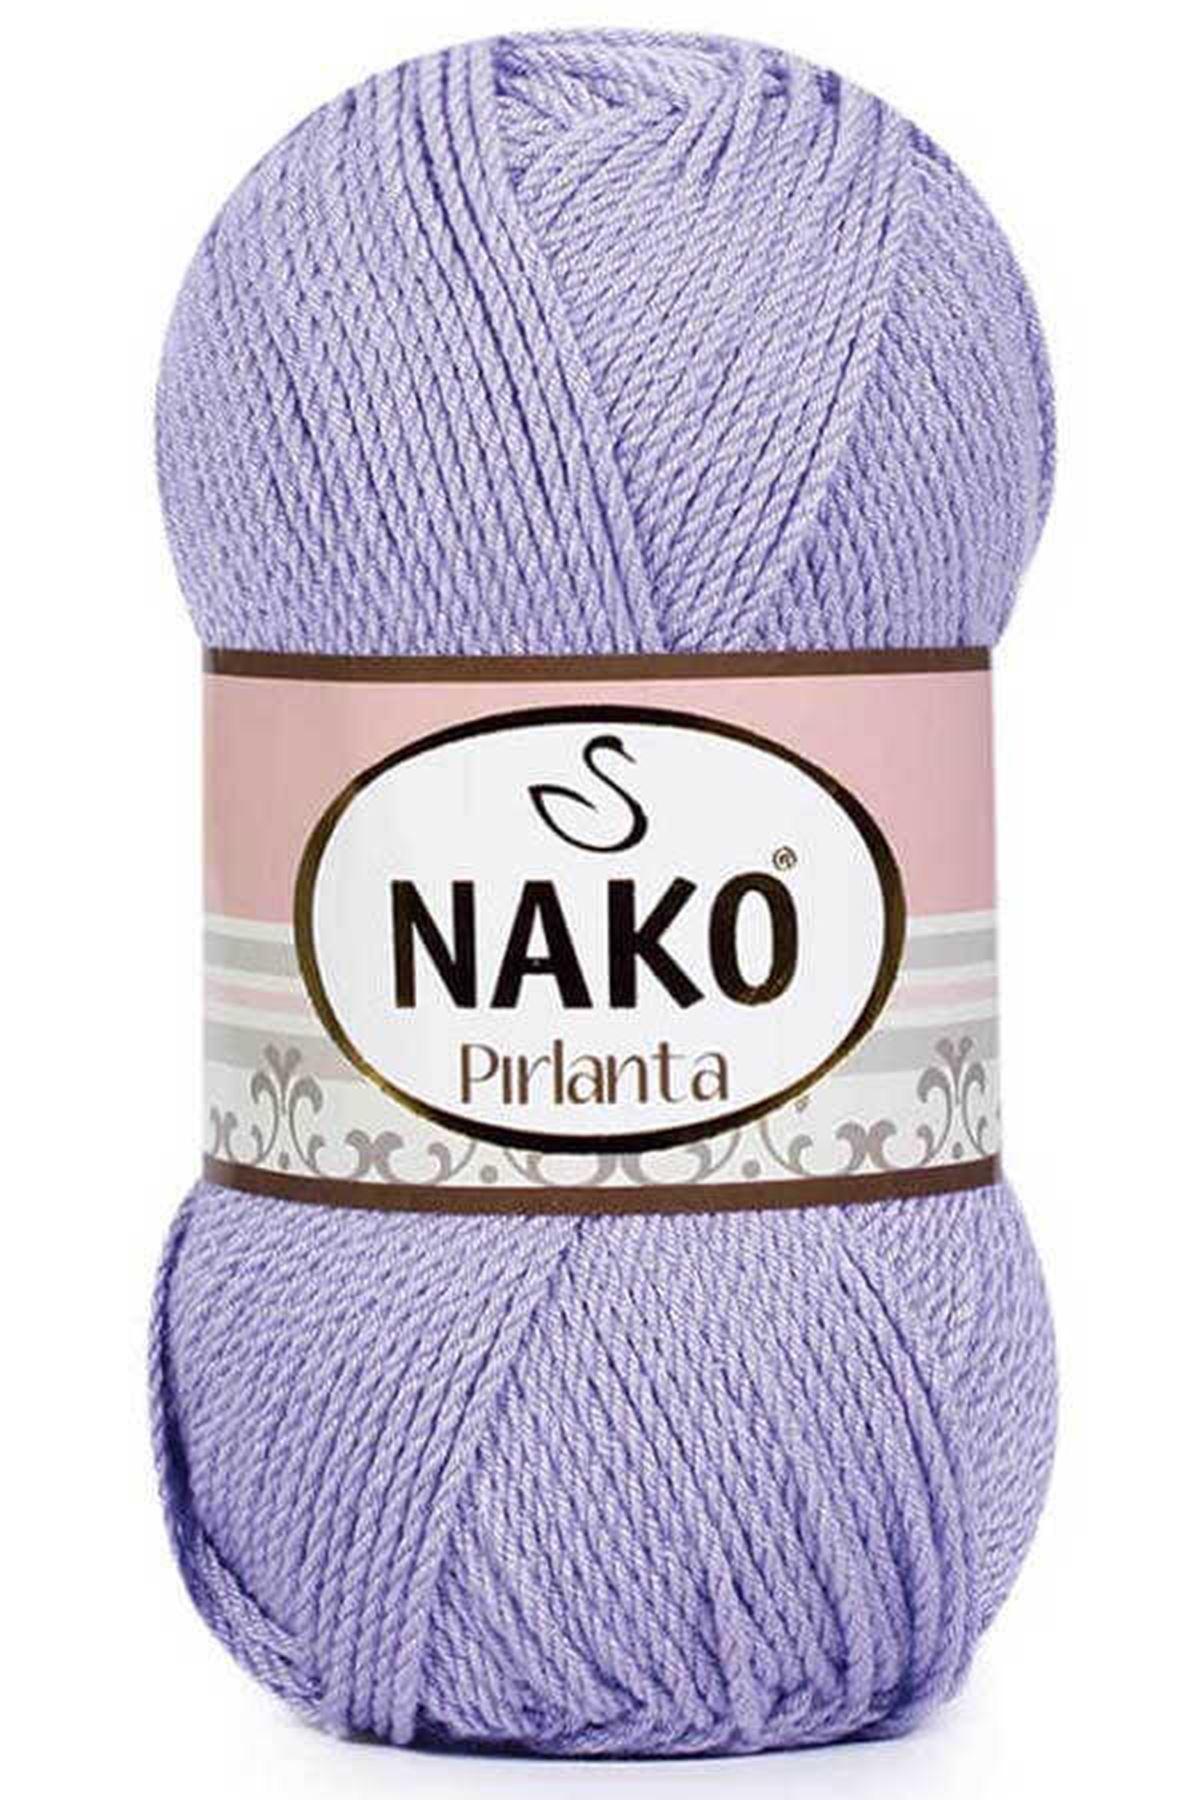 Nako Pırlanta-10491 Lavanta